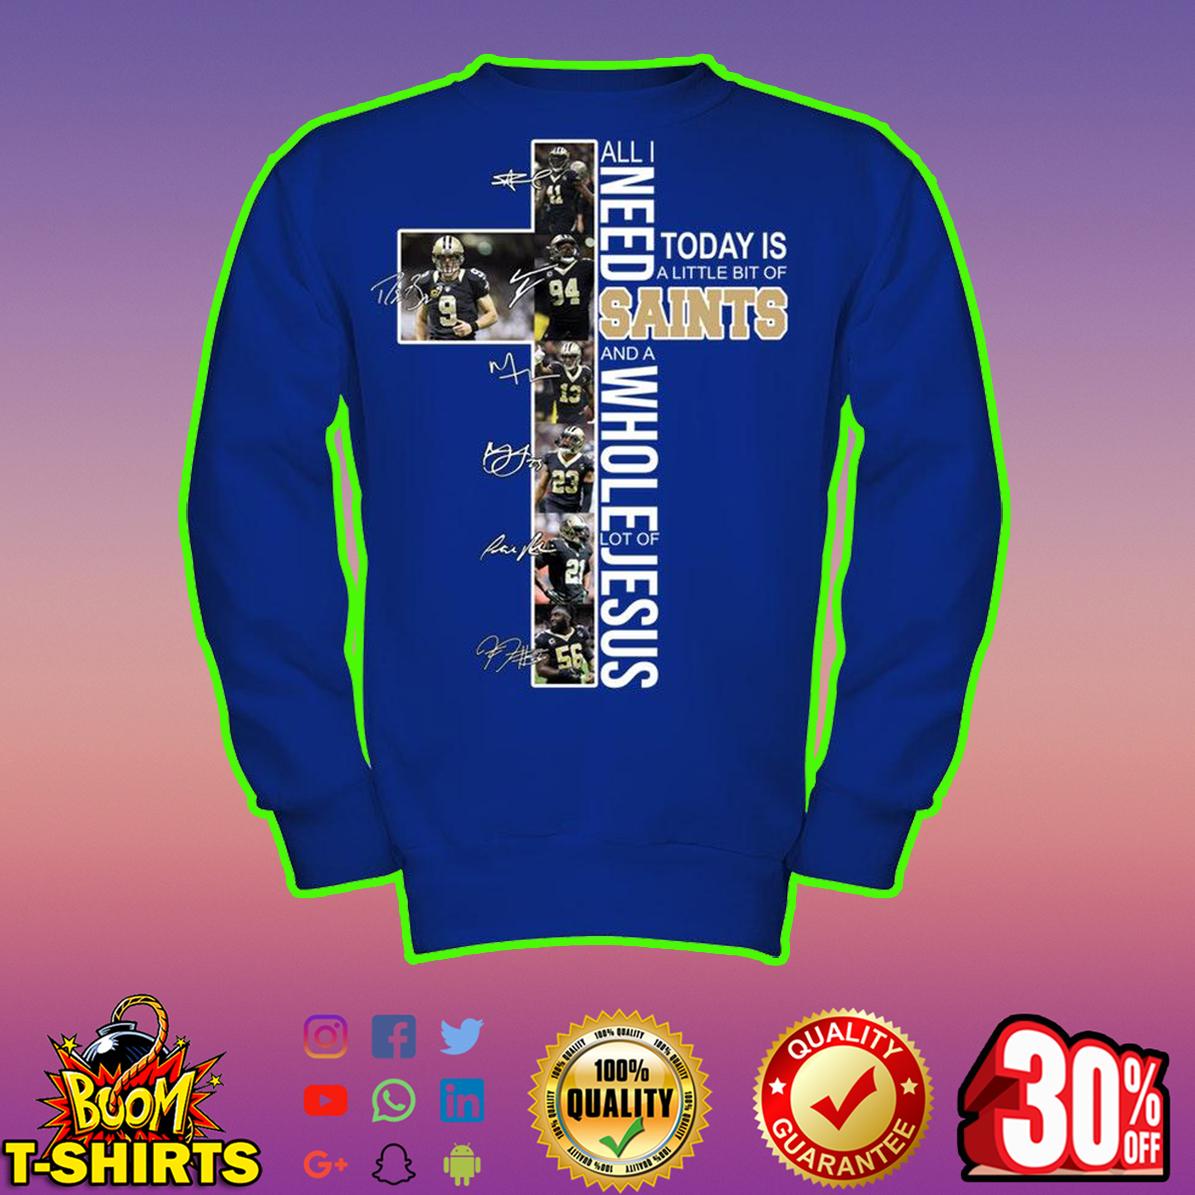 All I Need Today Is A Little Bit Of Saints Jesus Signature sweatshirt